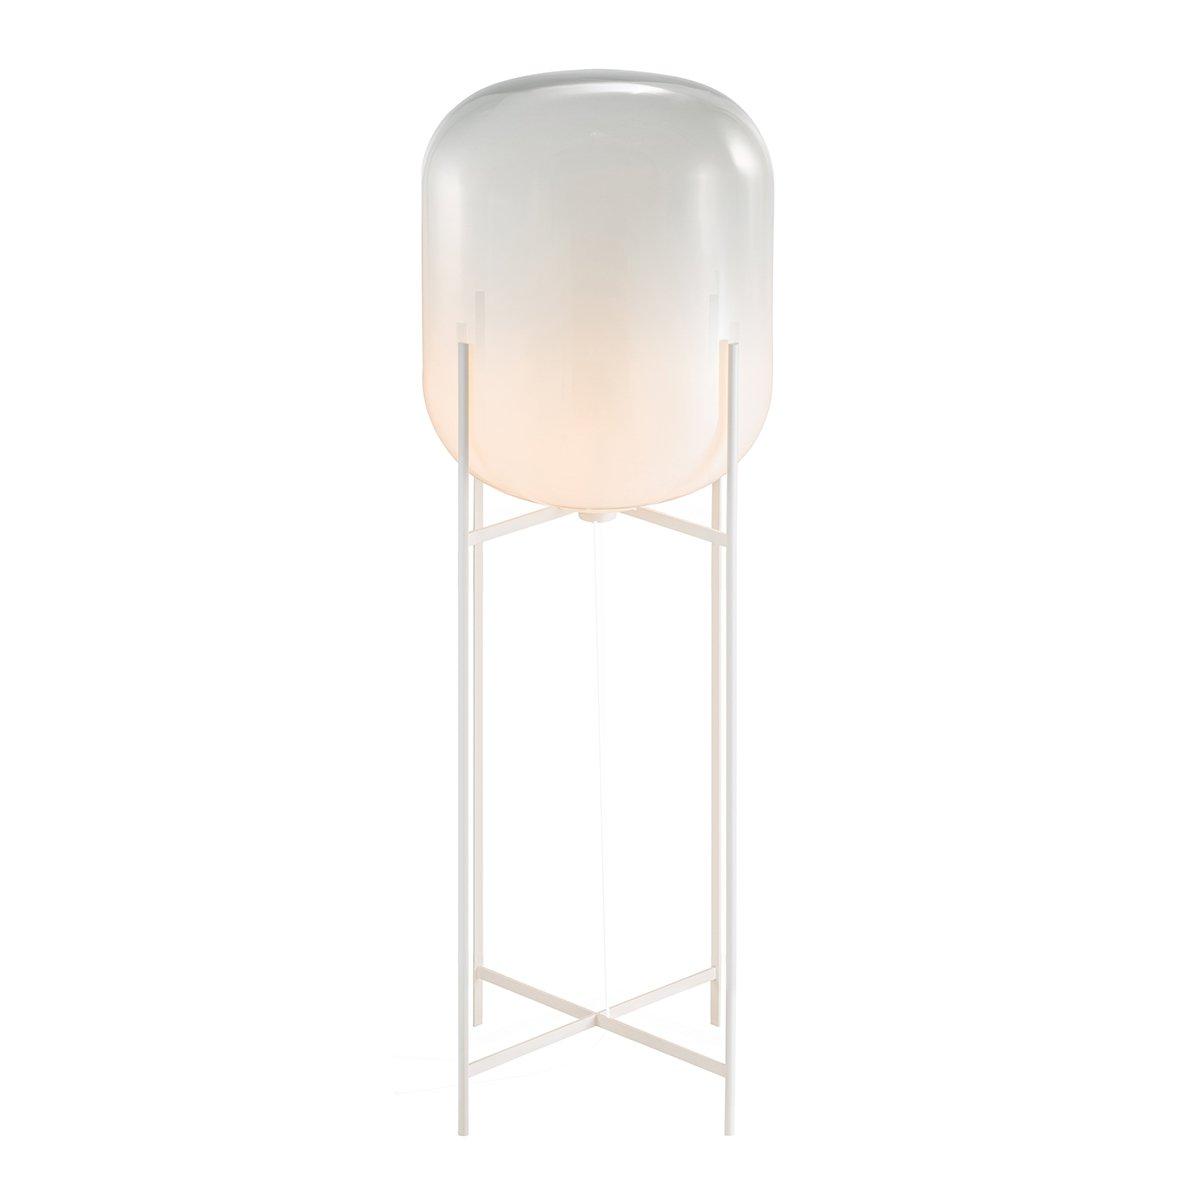 Pulpo Oda Vloerlamp Large (2014) - Sebastian Herkner